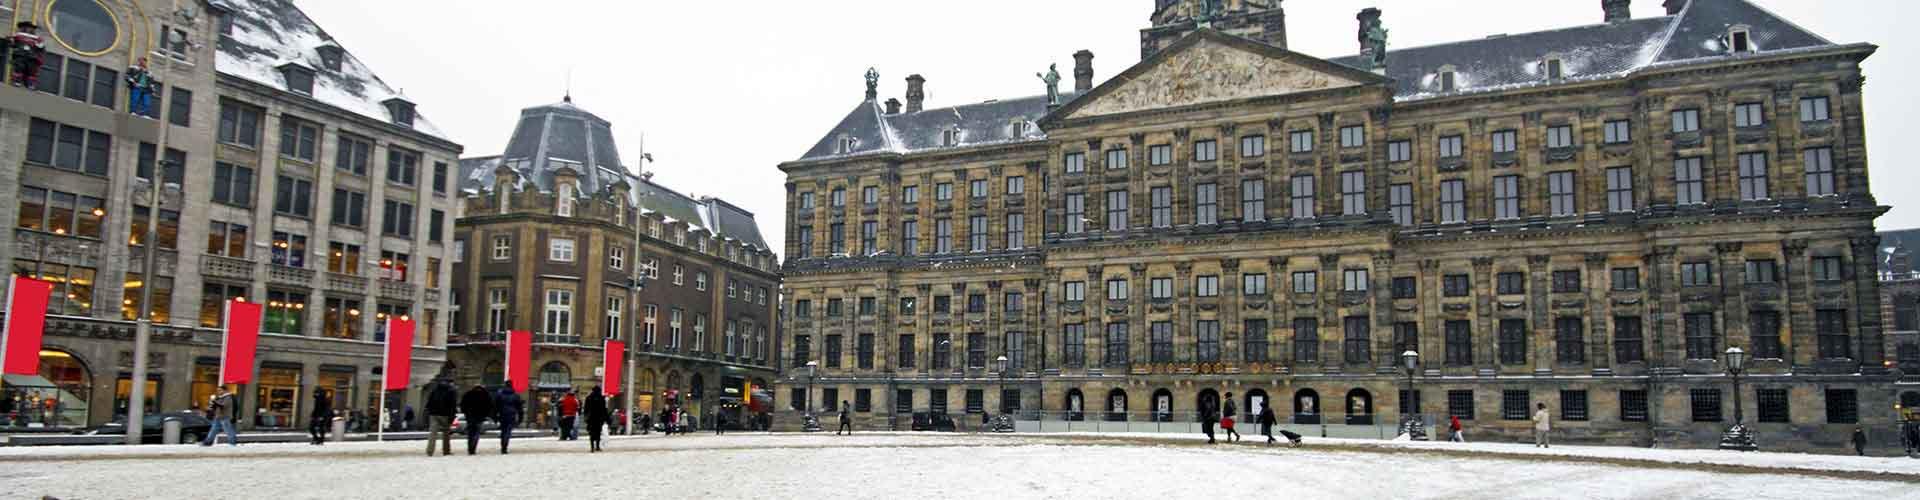 Amsterdam ostelli a amsterdam for Ostelli amsterdam